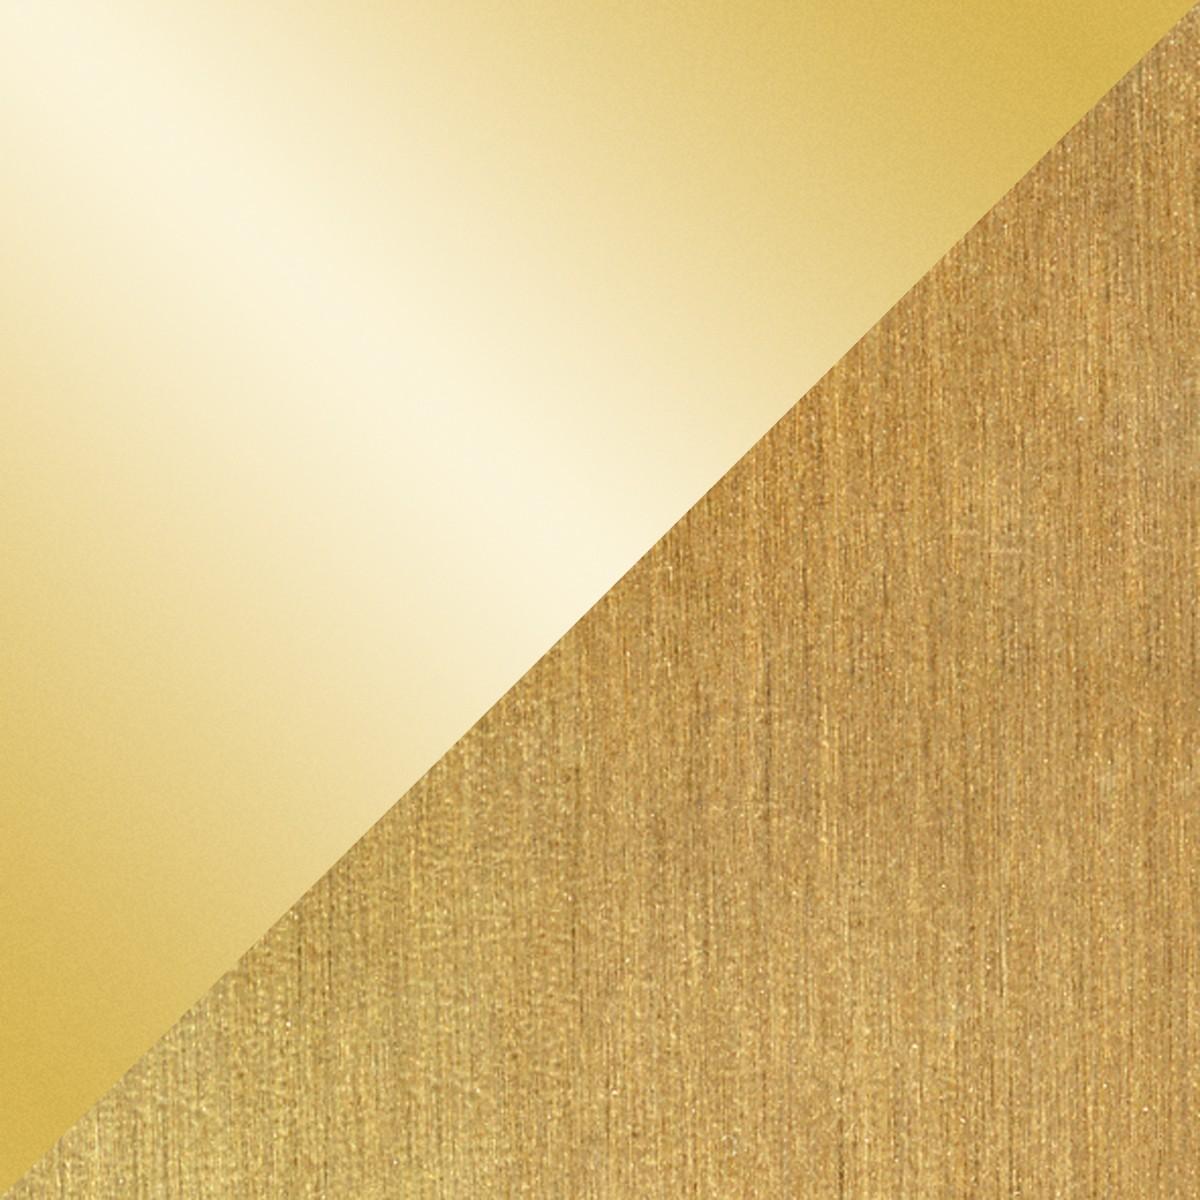 Holtkötter Leuchten 9604 Stehleuchte, Messing poliert / matt